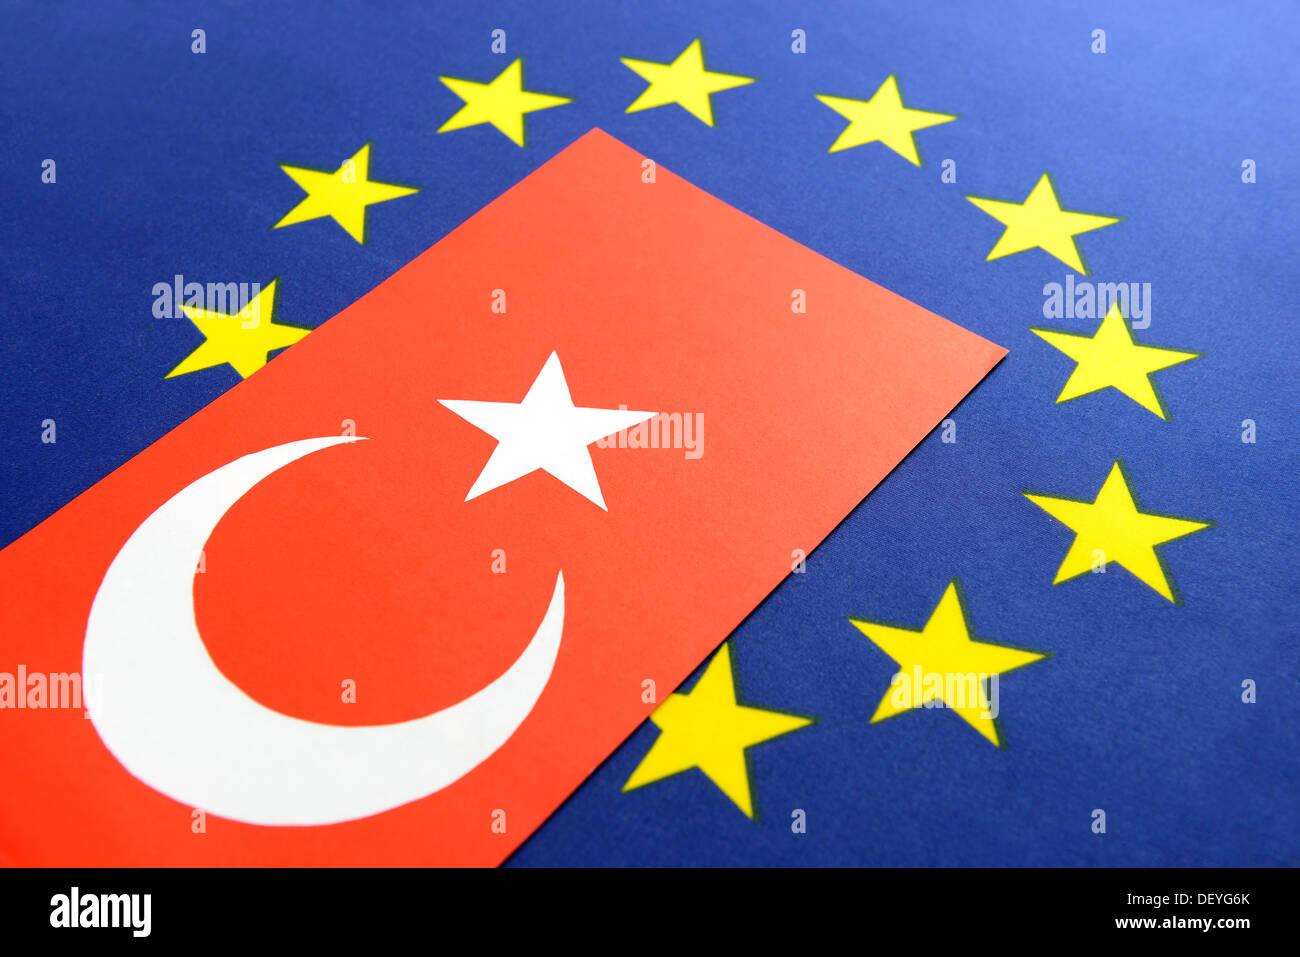 Turkey flag and EU flag, EU negotiation of accession with Turkey - Stock Image